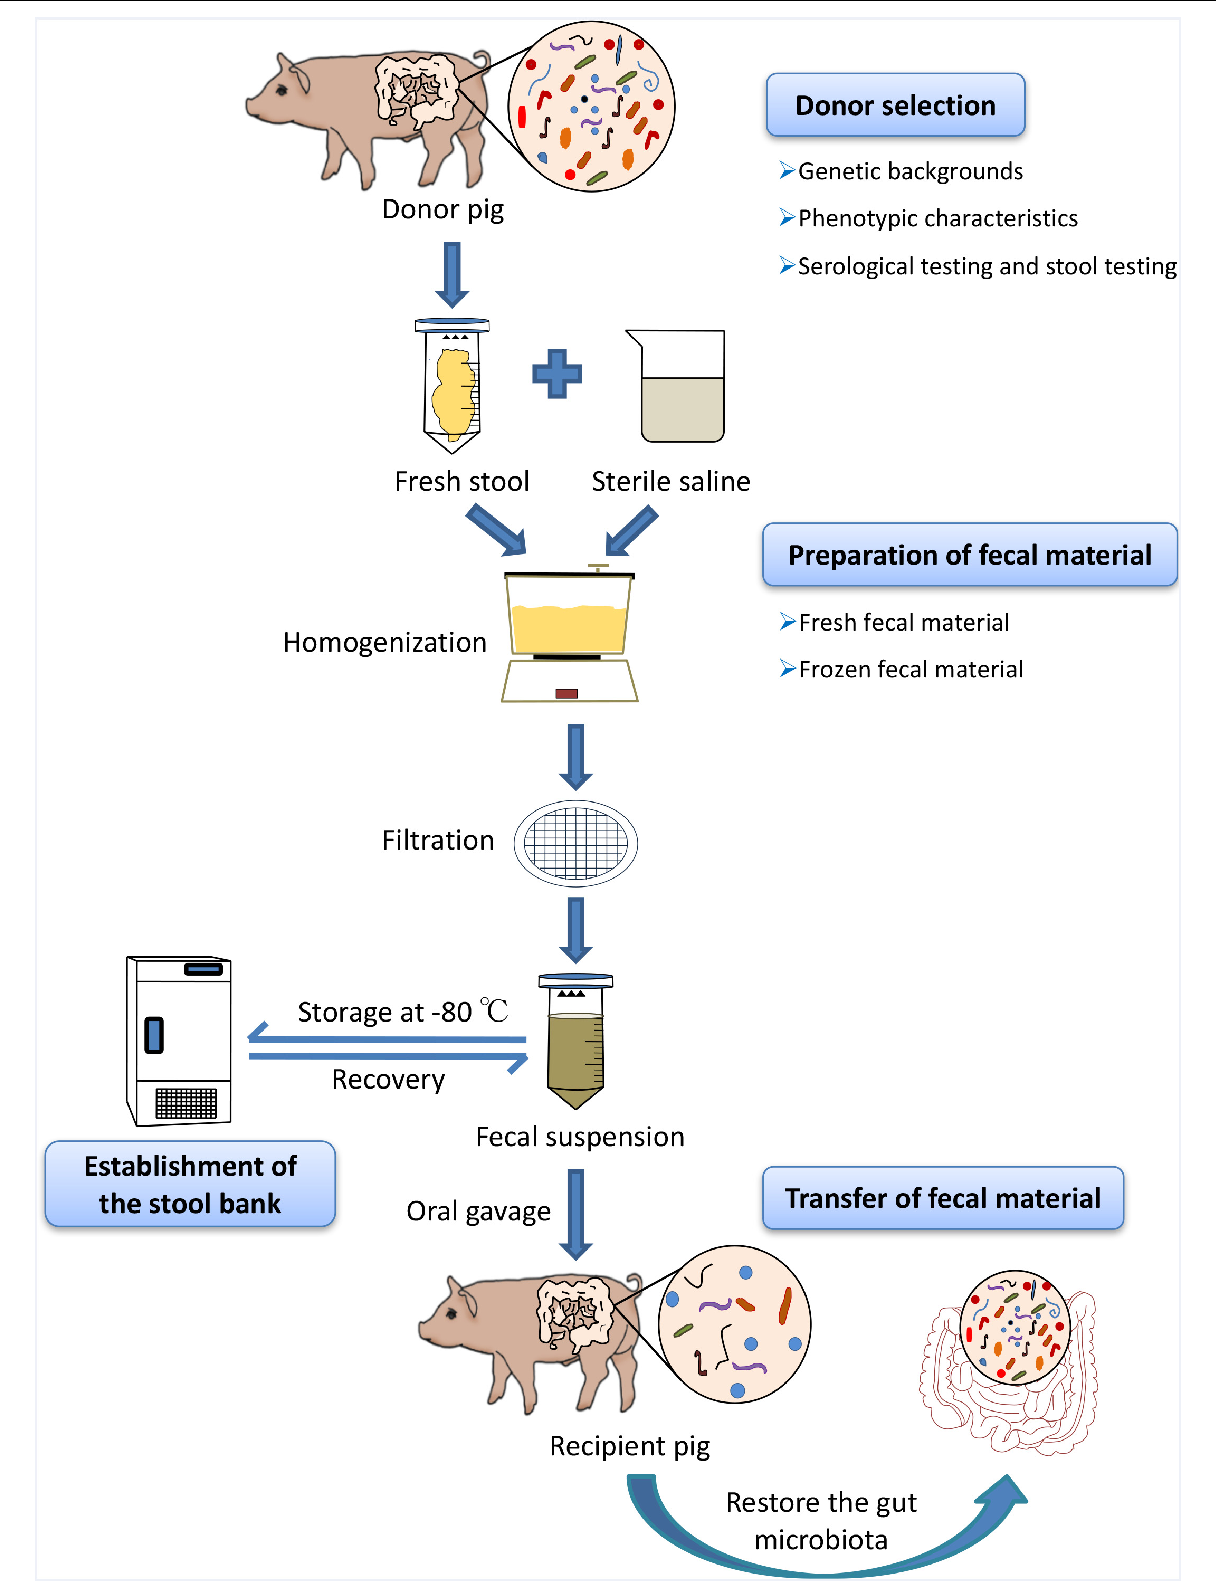 Preparations that restore intestinal microflora